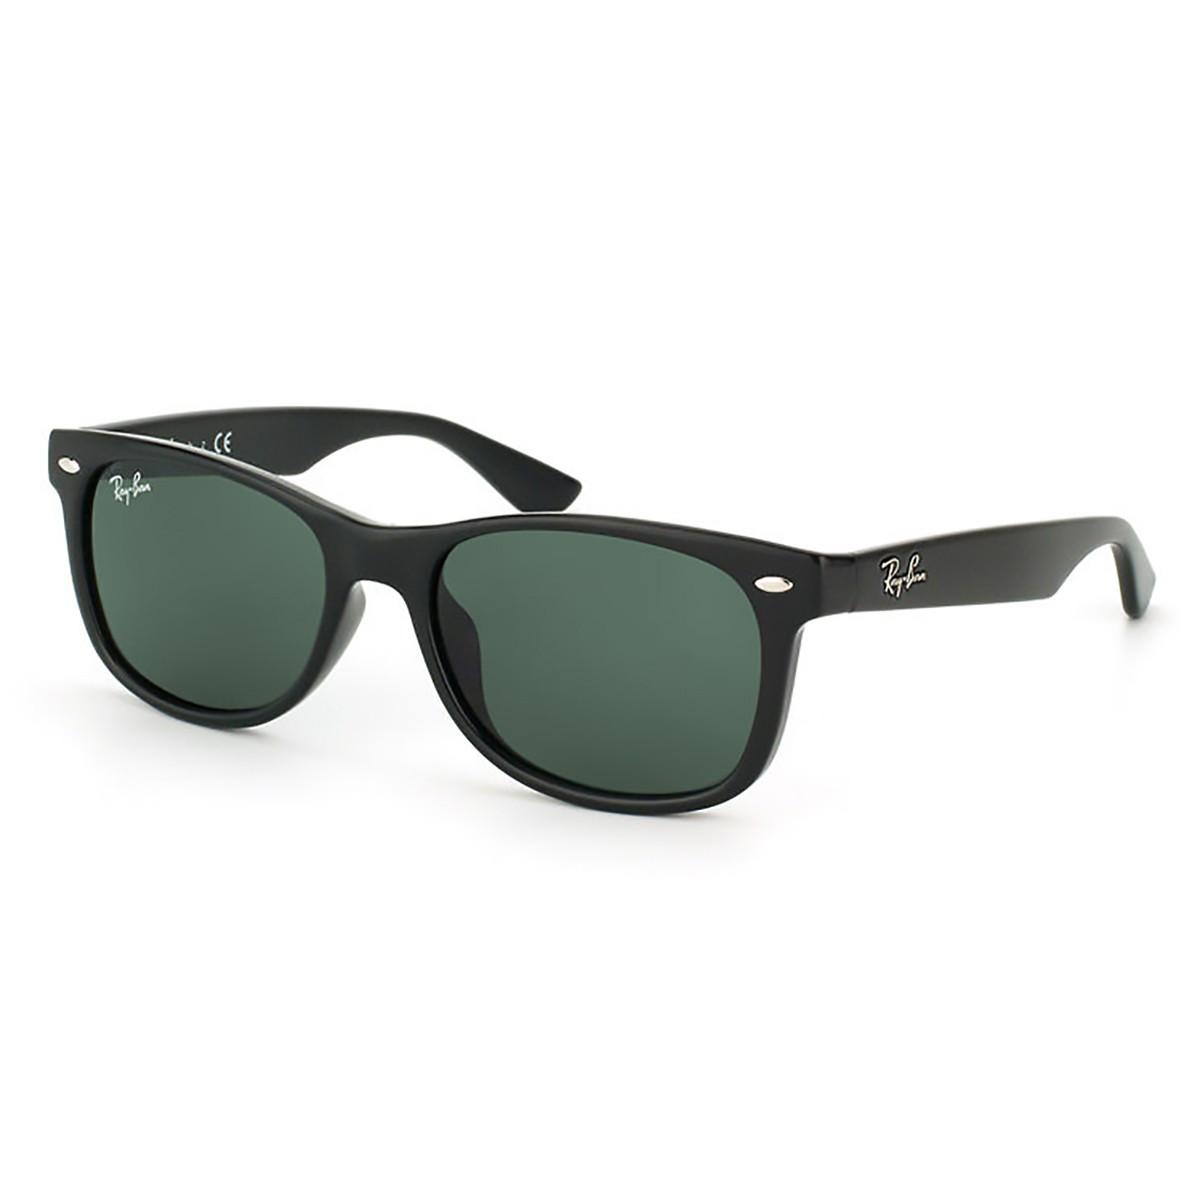 31c16bac1615b Compre Óculos de Sol Ray Ban New Wayfarer Infantil em 10X   Tri-Jóia Shop